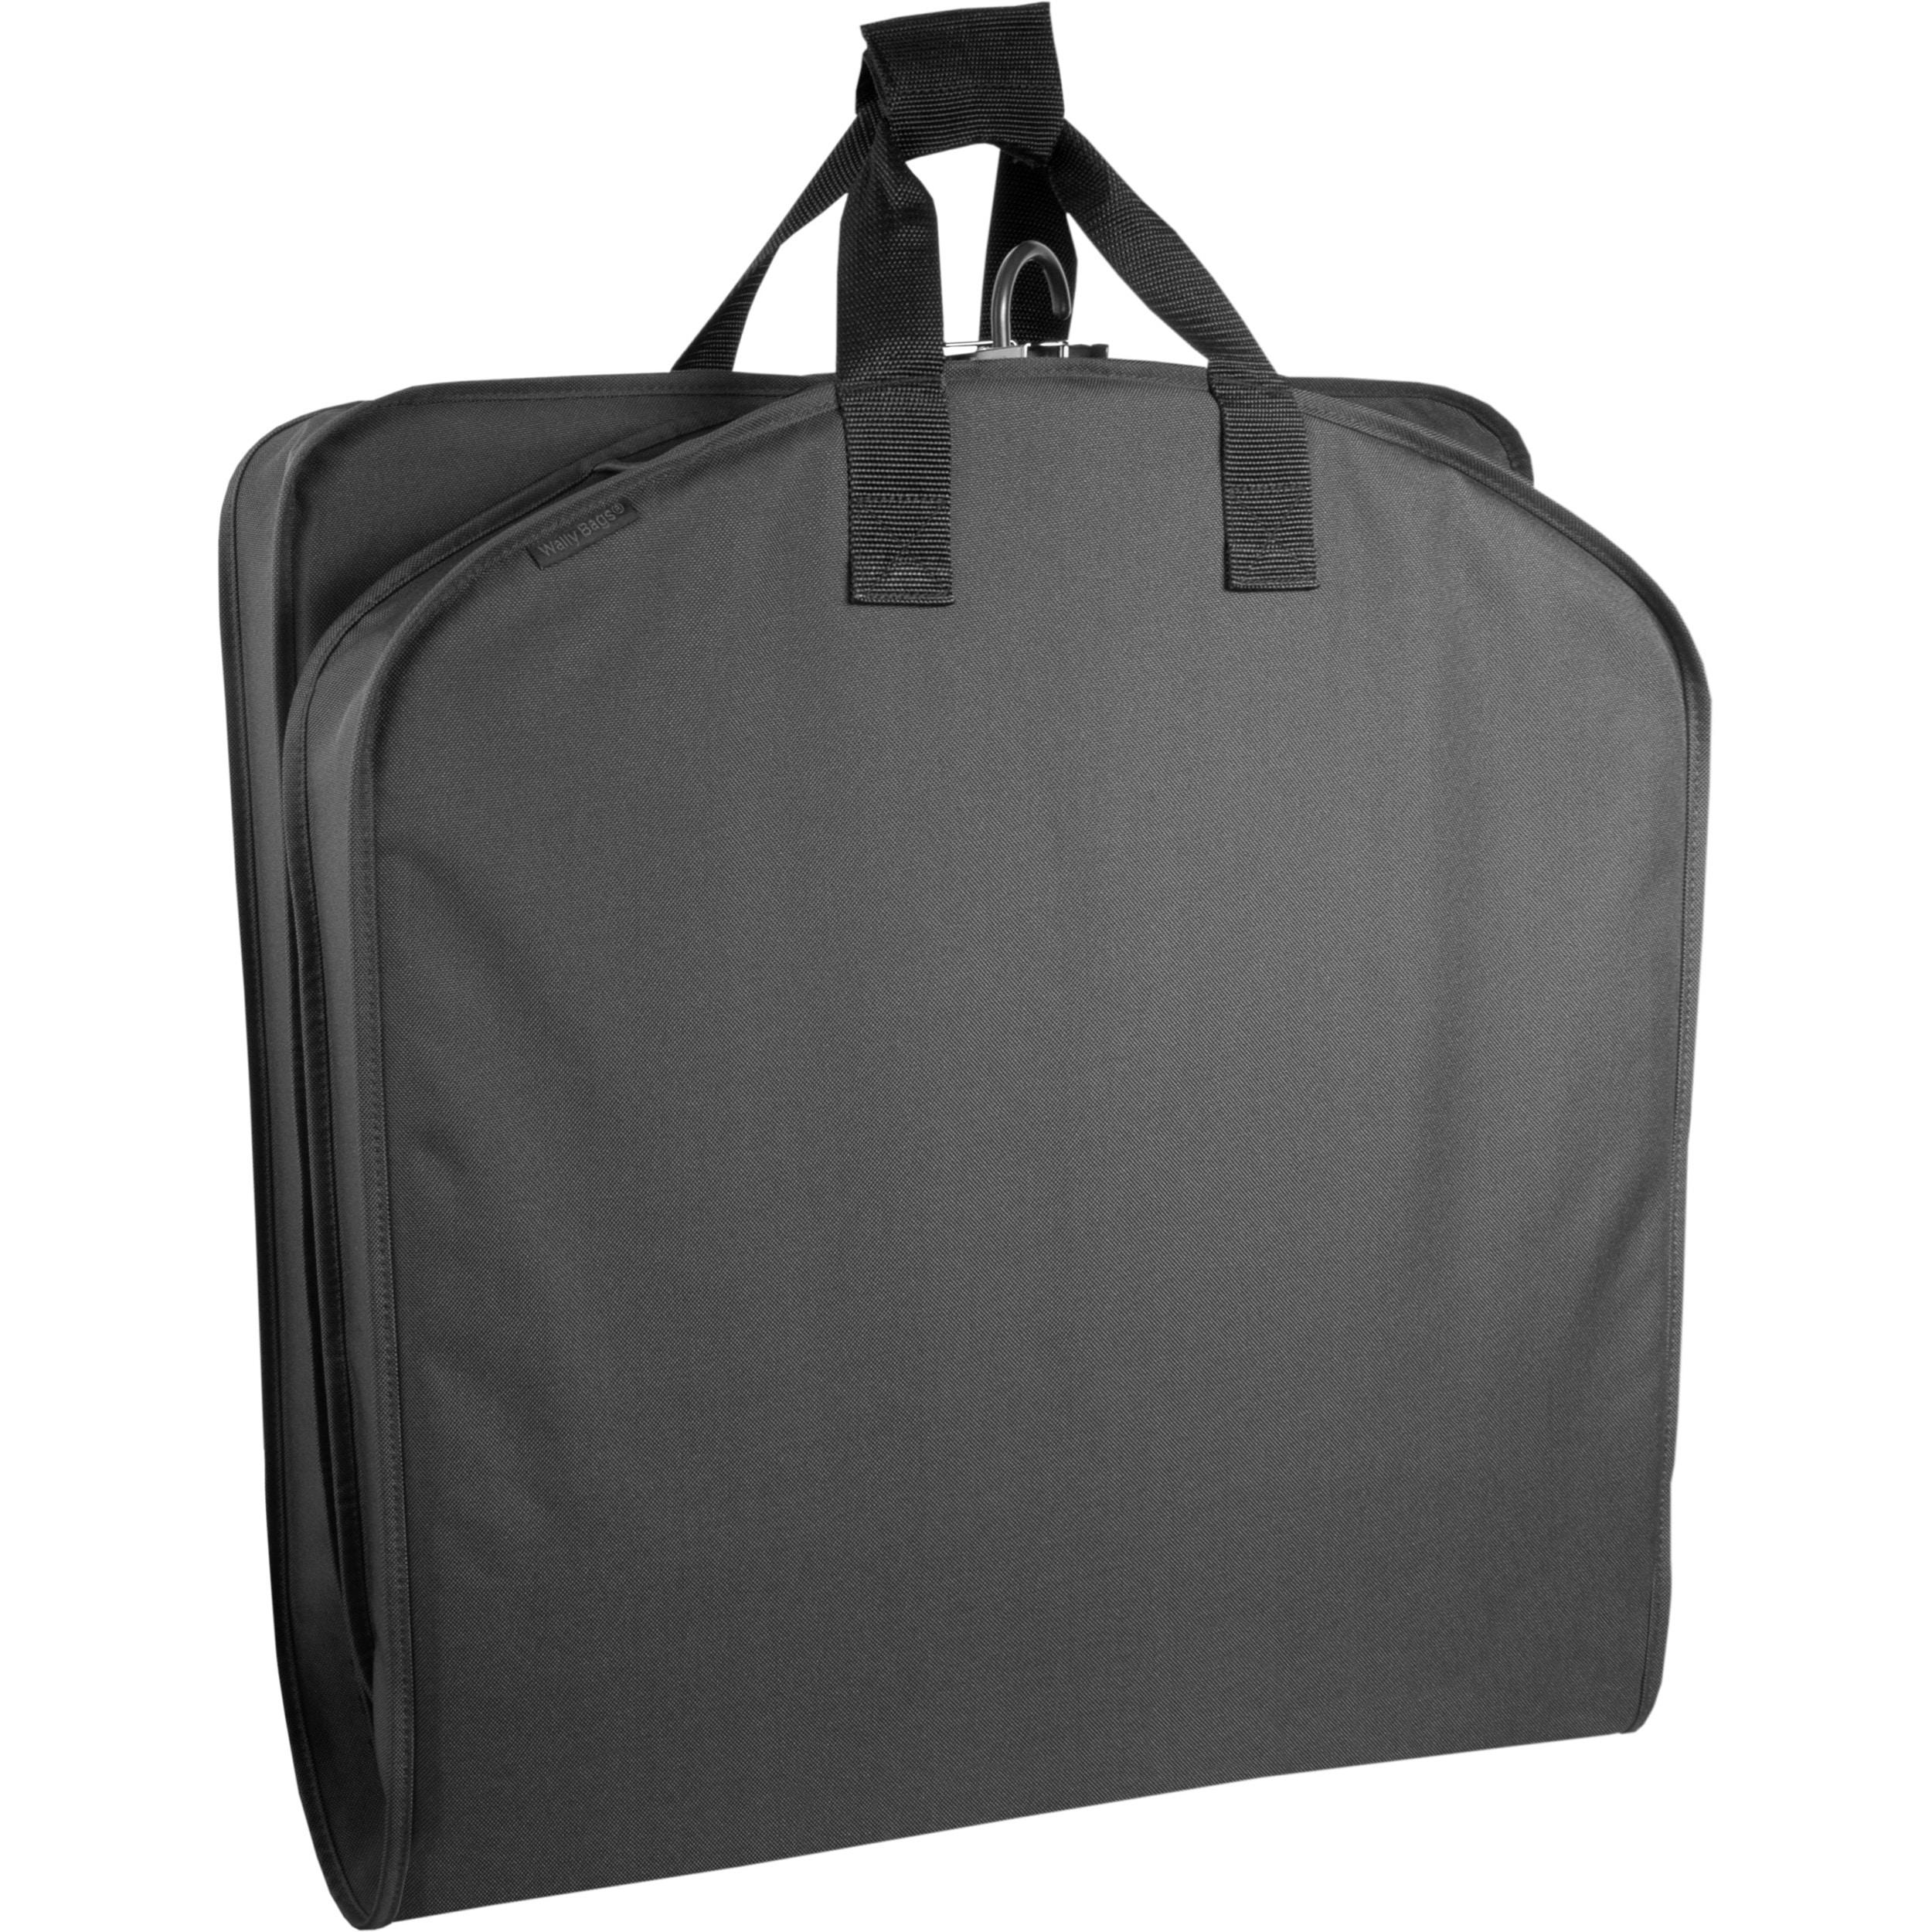 Wally Bags WallyBags 60-inch Garment Bag (Black)